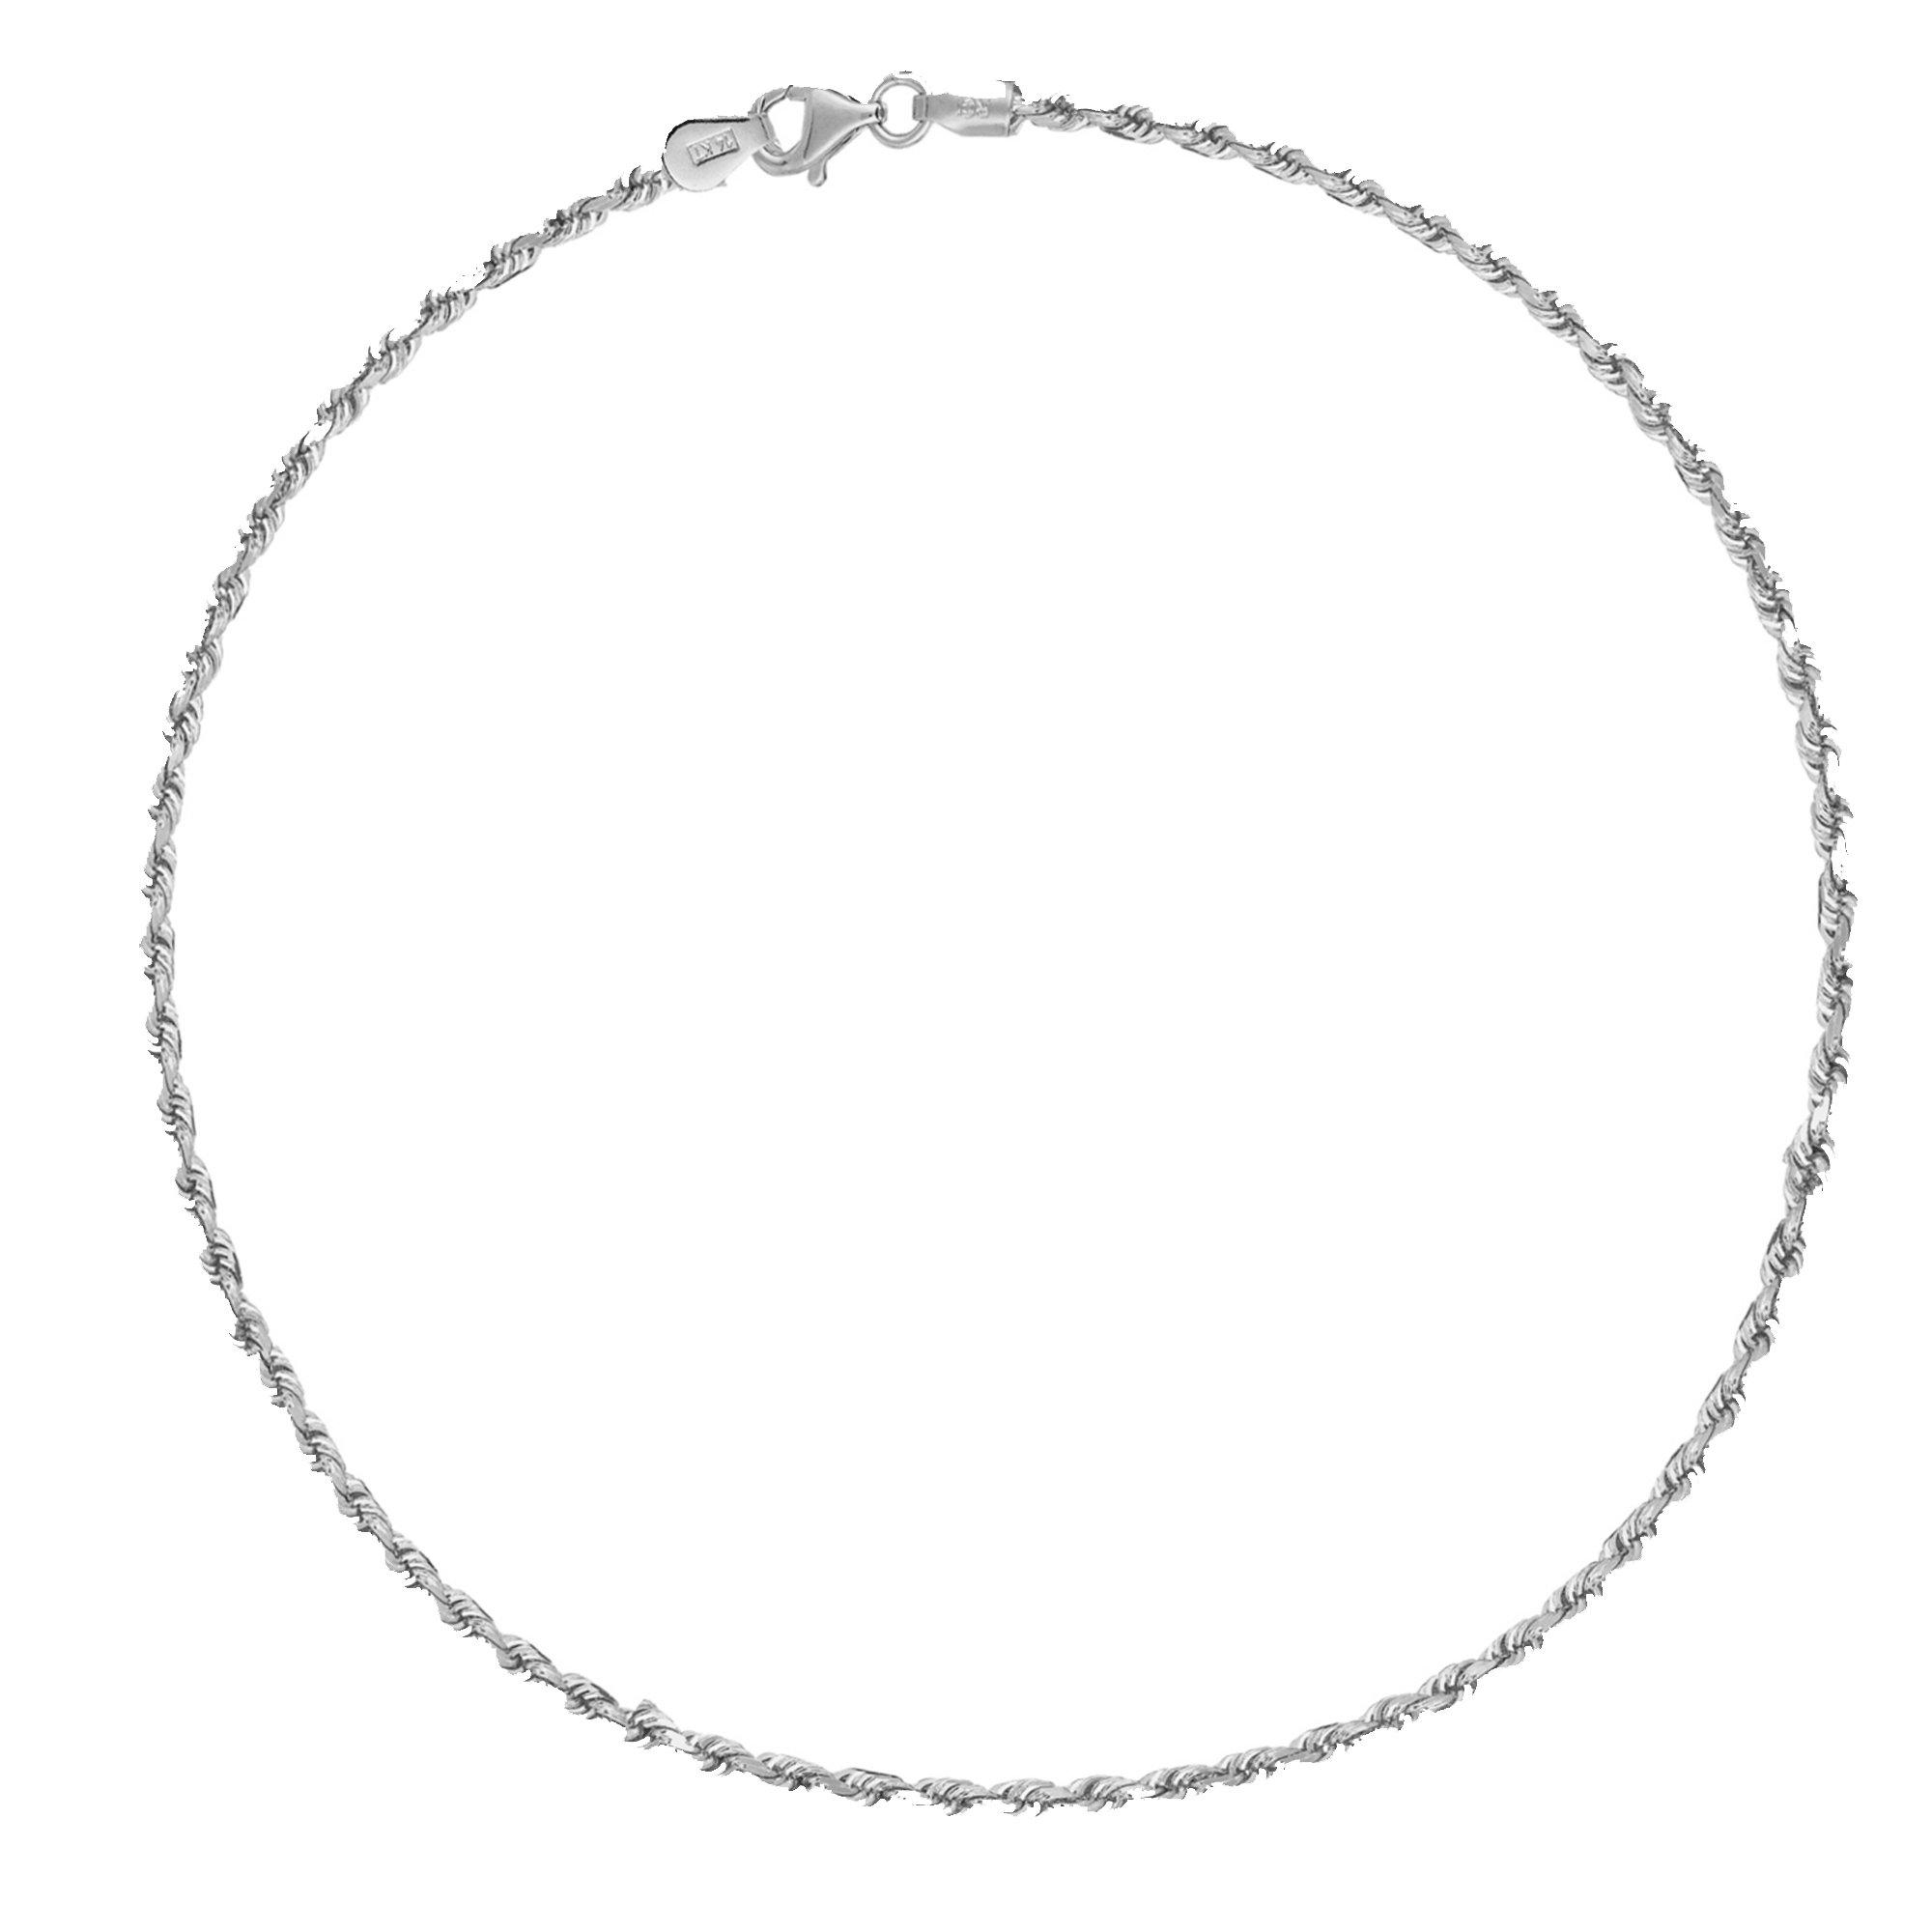 Sterling Silver Italian Rope Chain Lobster-Lock Anklet or Bracelet 1.8mm width